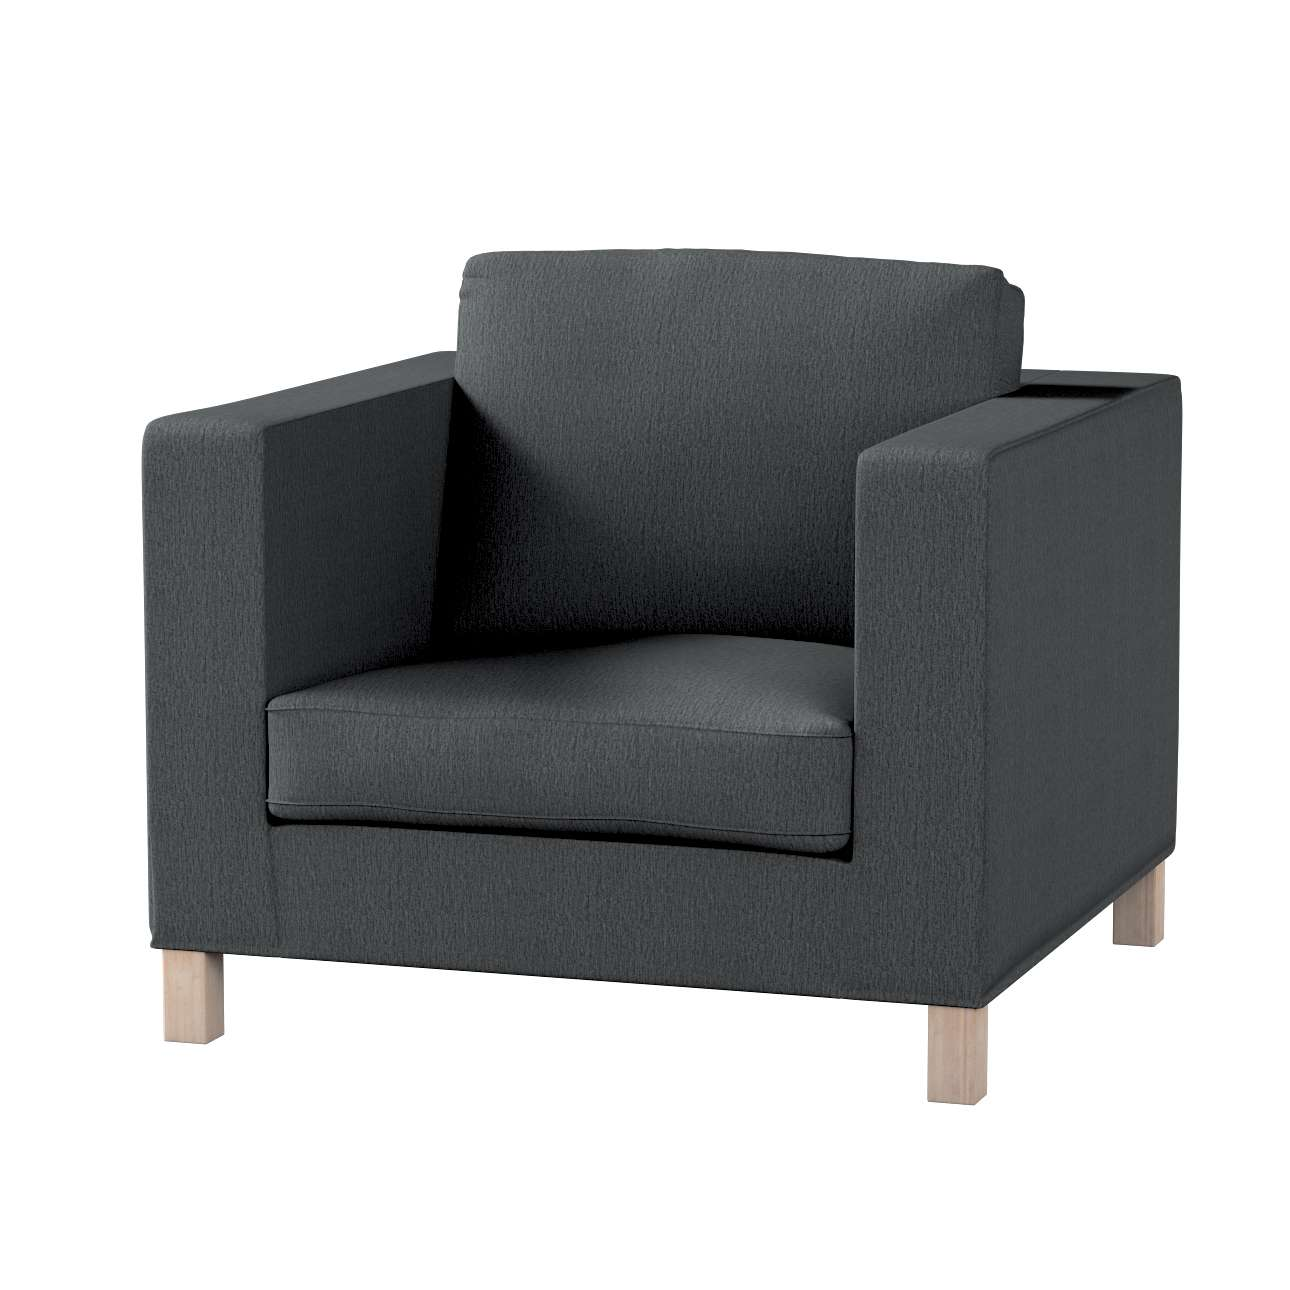 Pokrowiec na fotel Karlanda, krótki fotel Karlanda w kolekcji Chenille, tkanina: 702-20